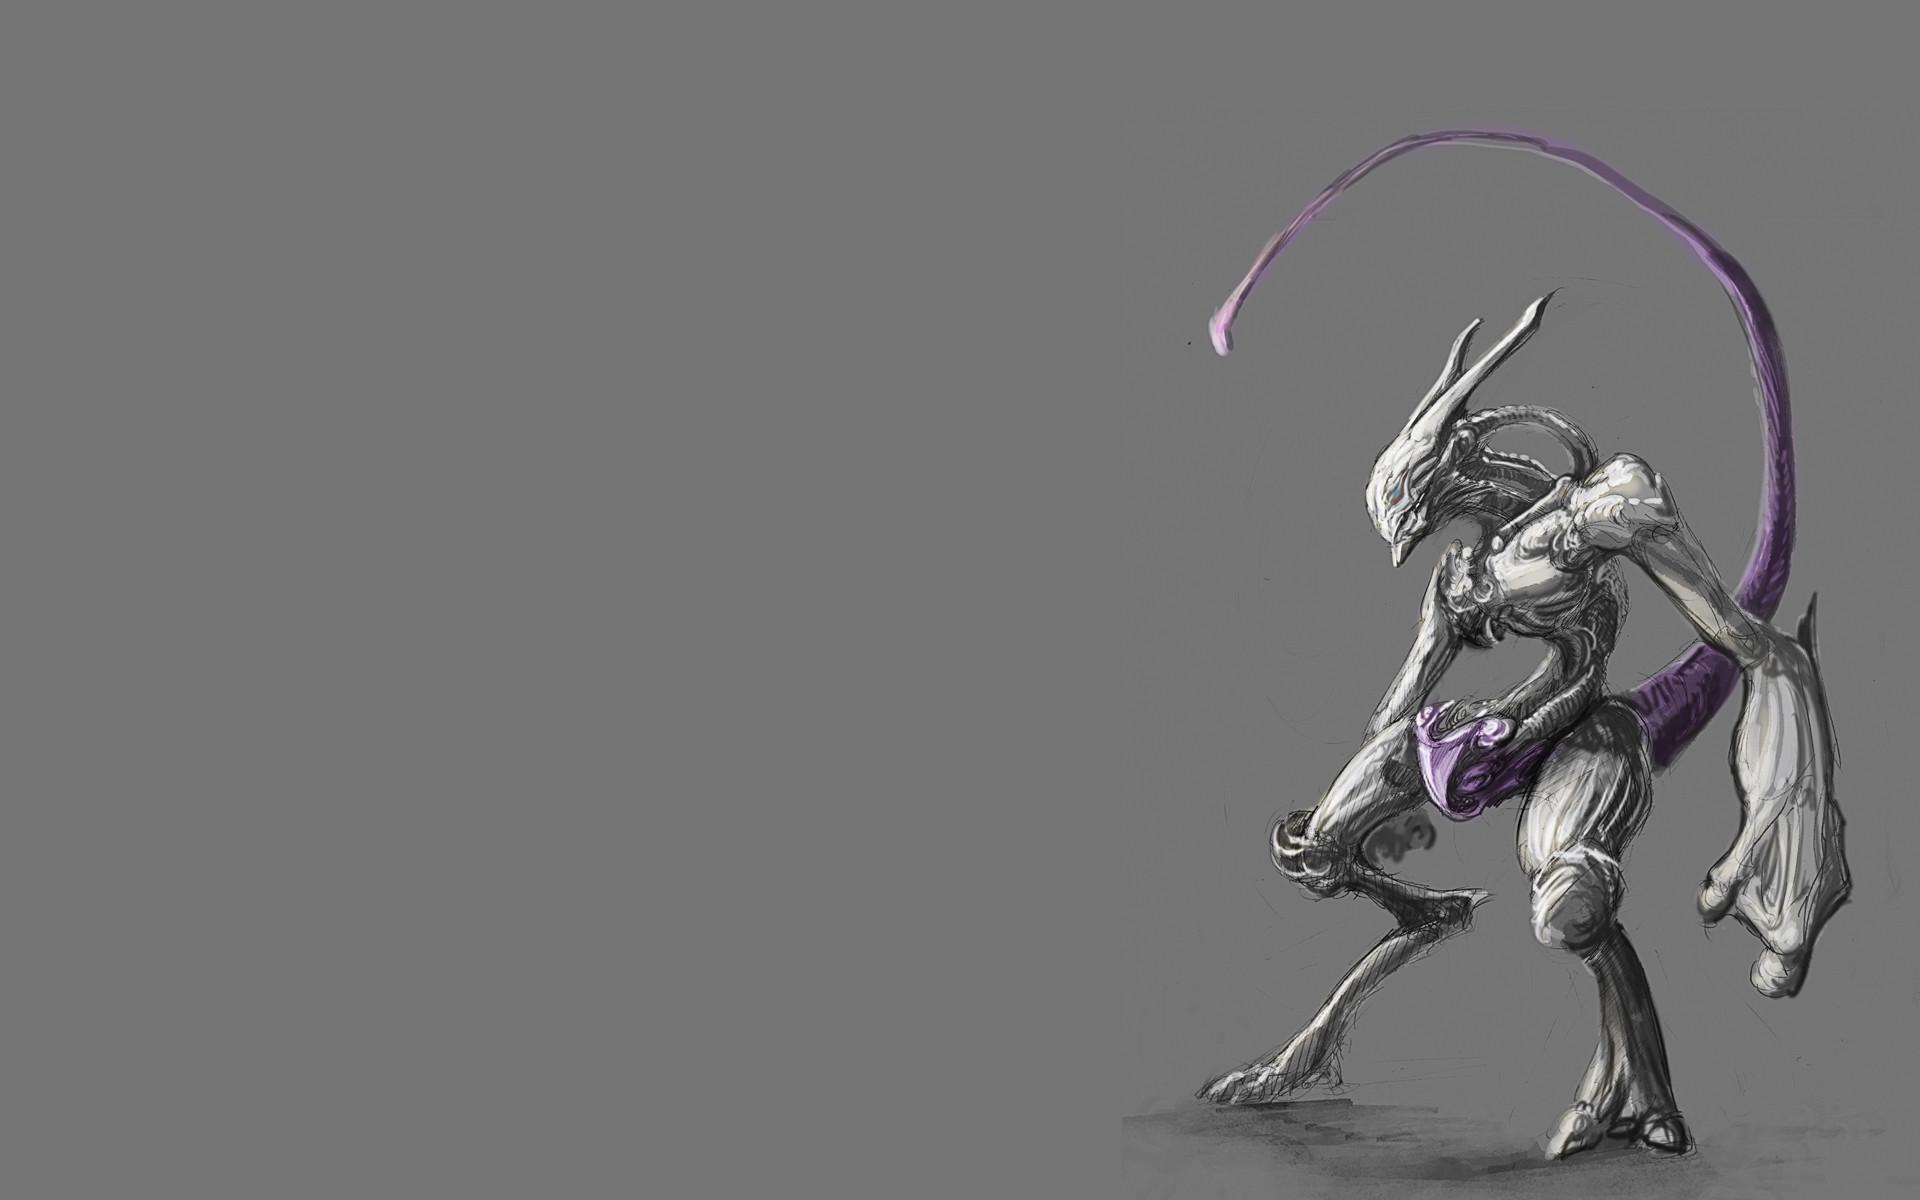 MewThree Pokemon Wallpaper